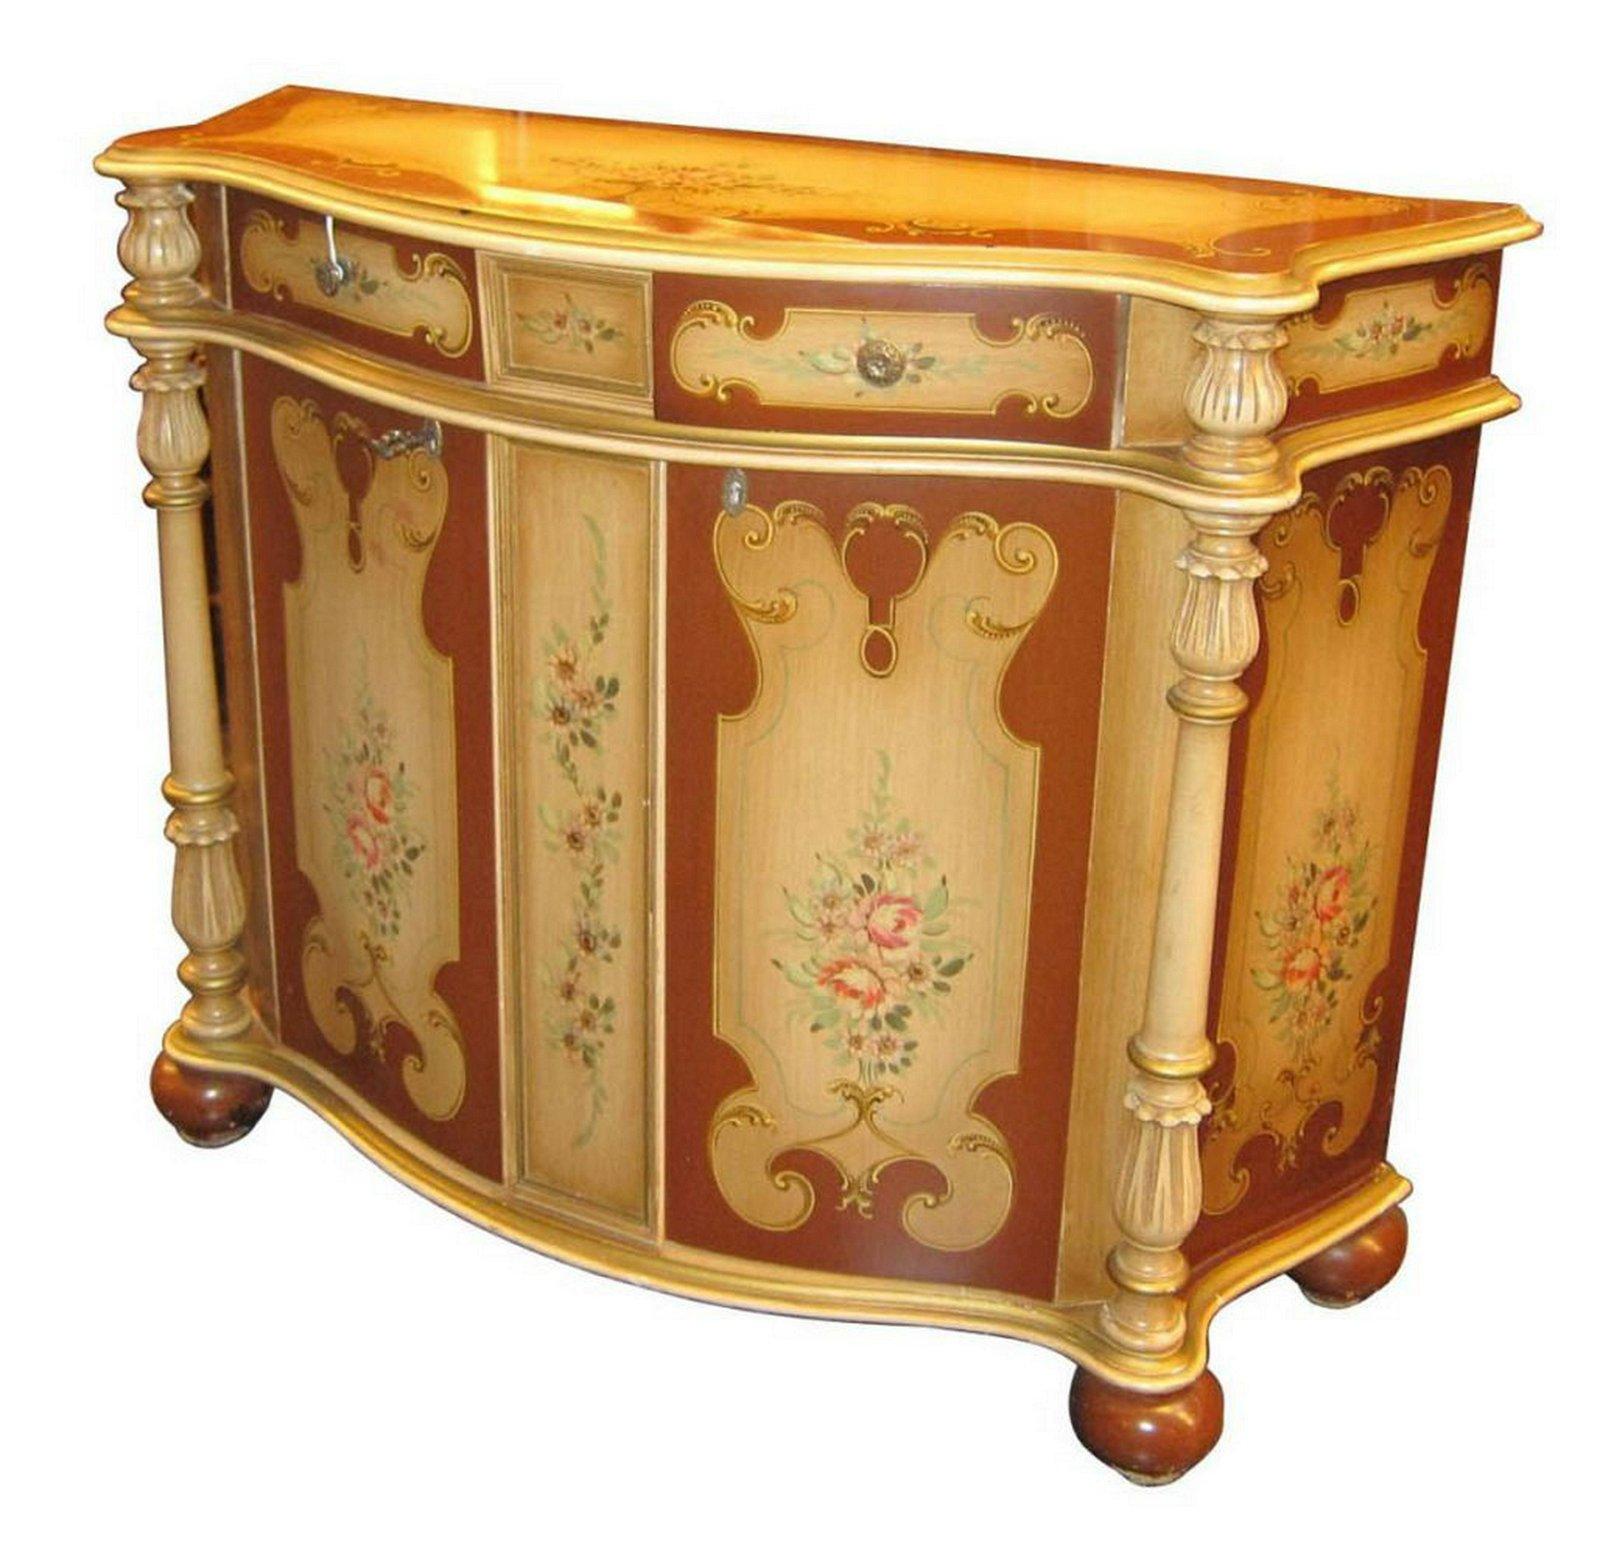 Florentine-style console